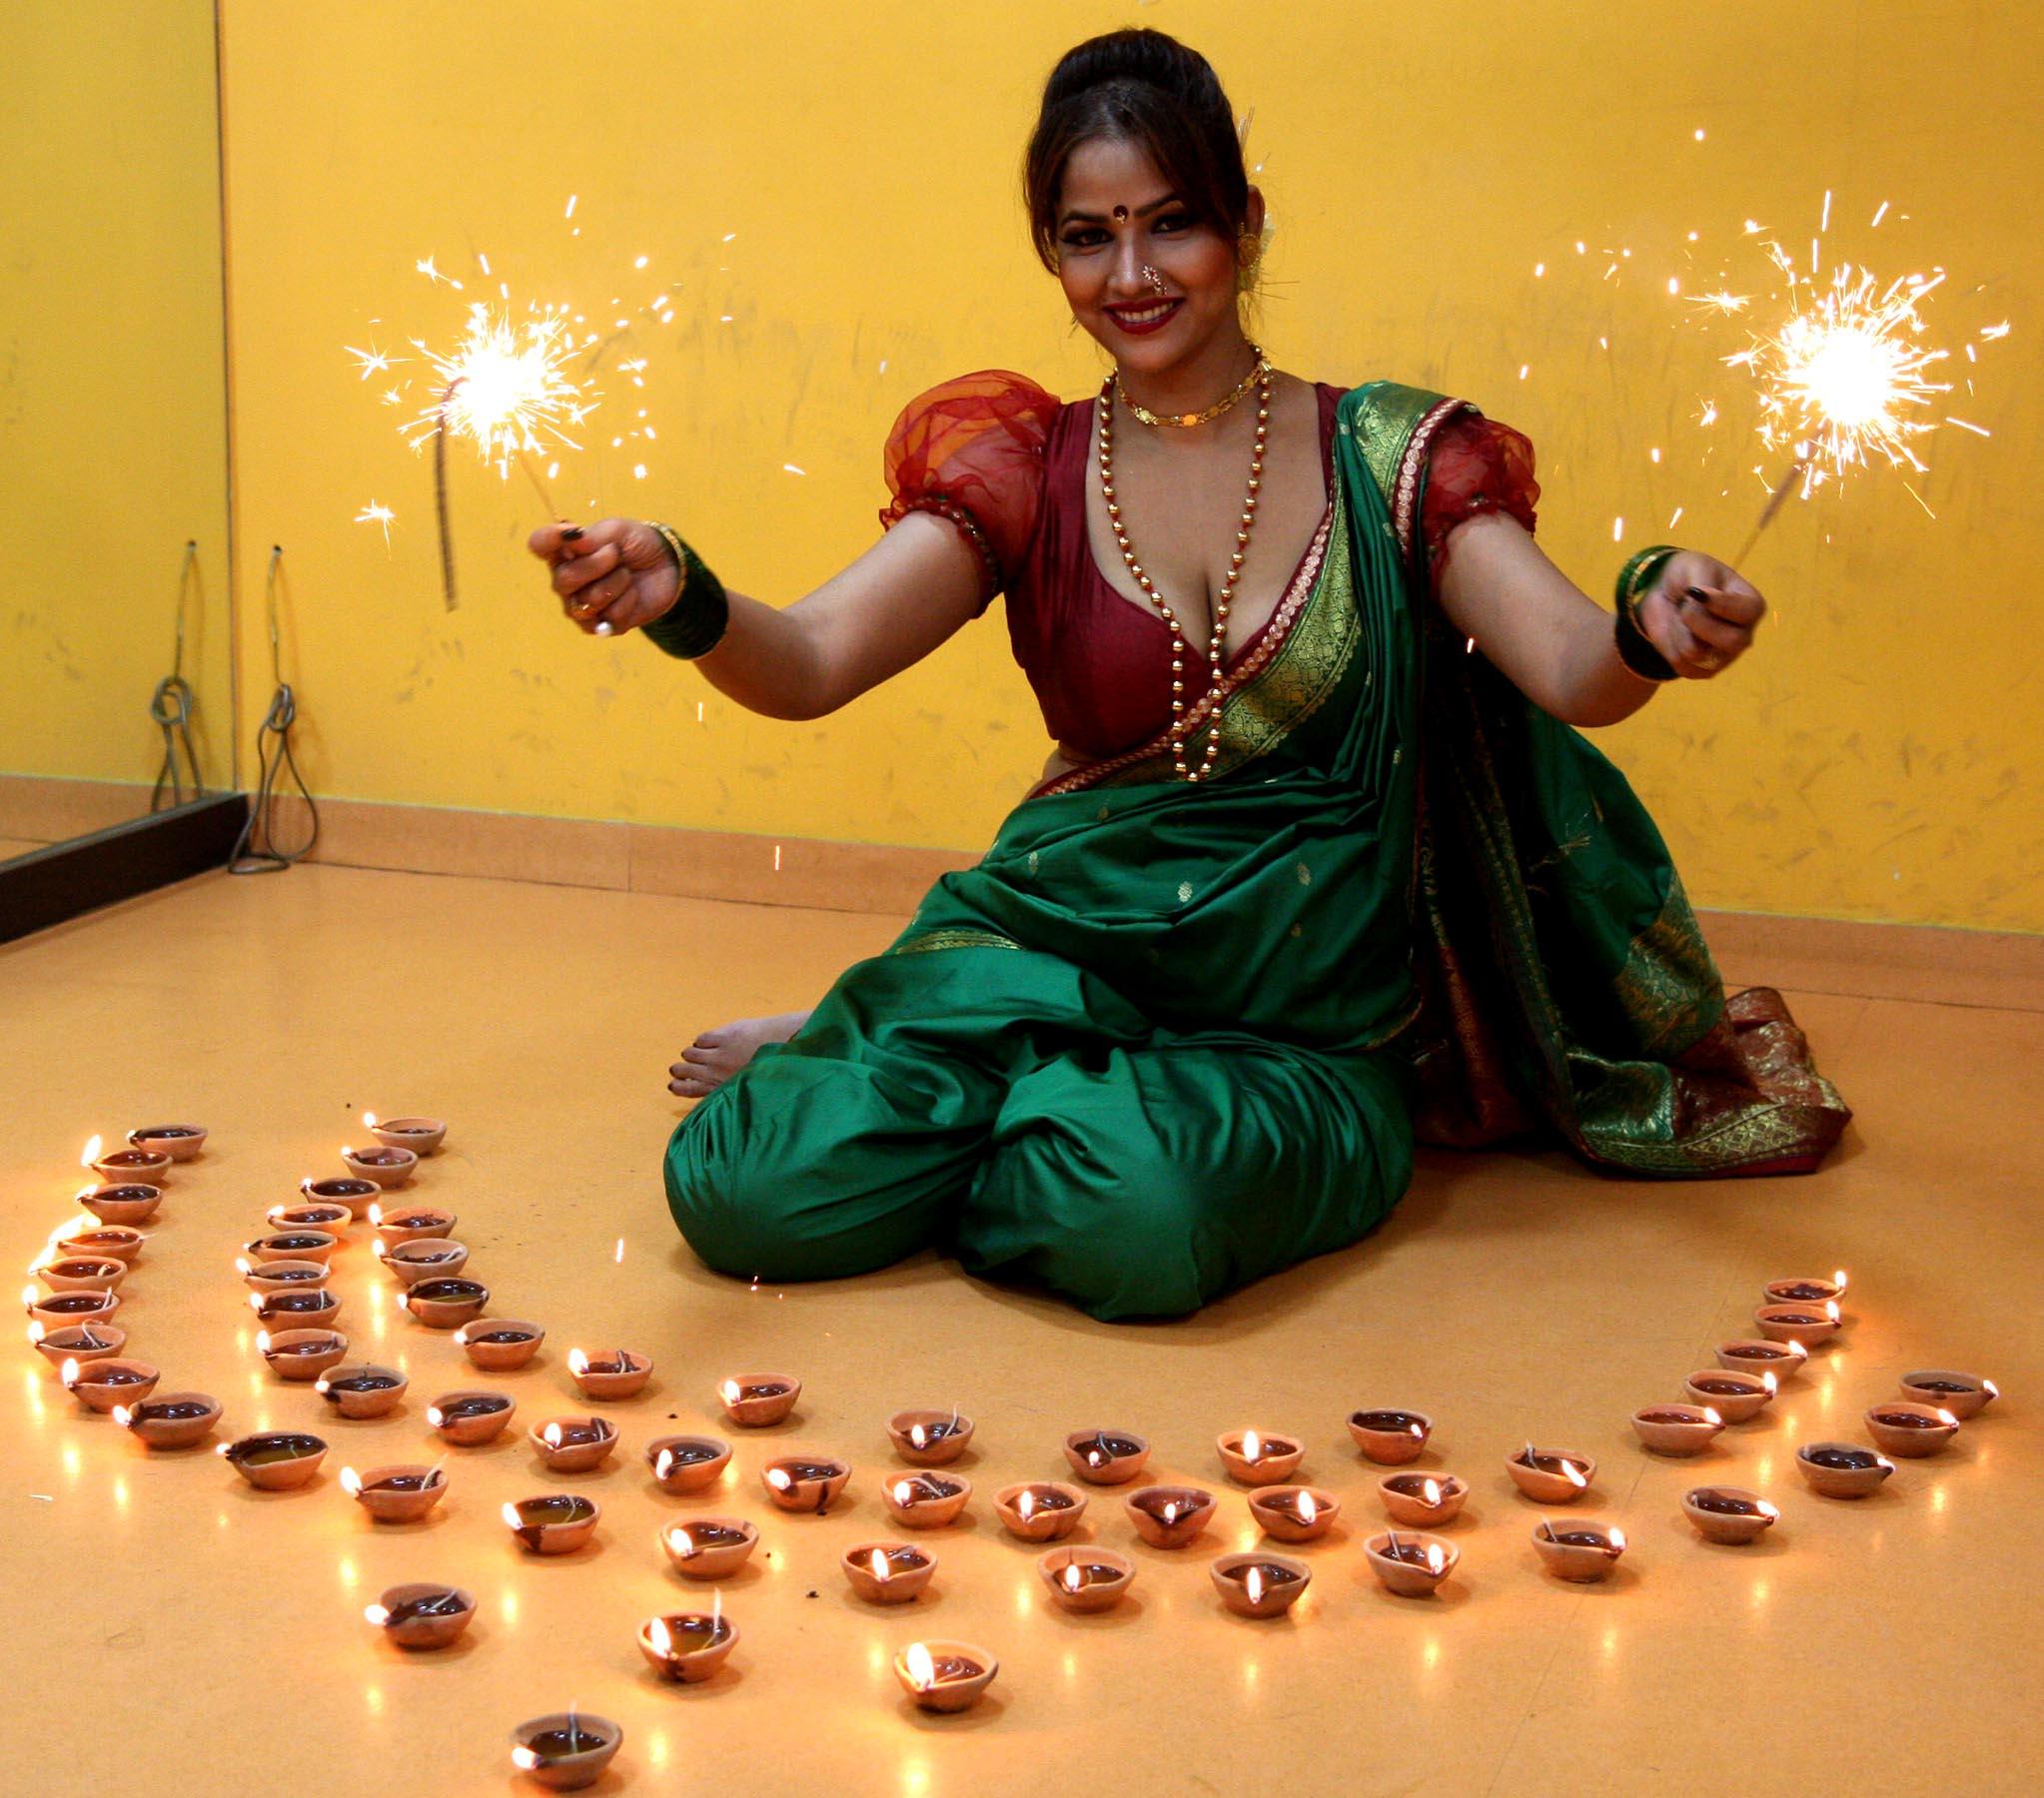 south actress tanisha singh did diwali photo shoot in